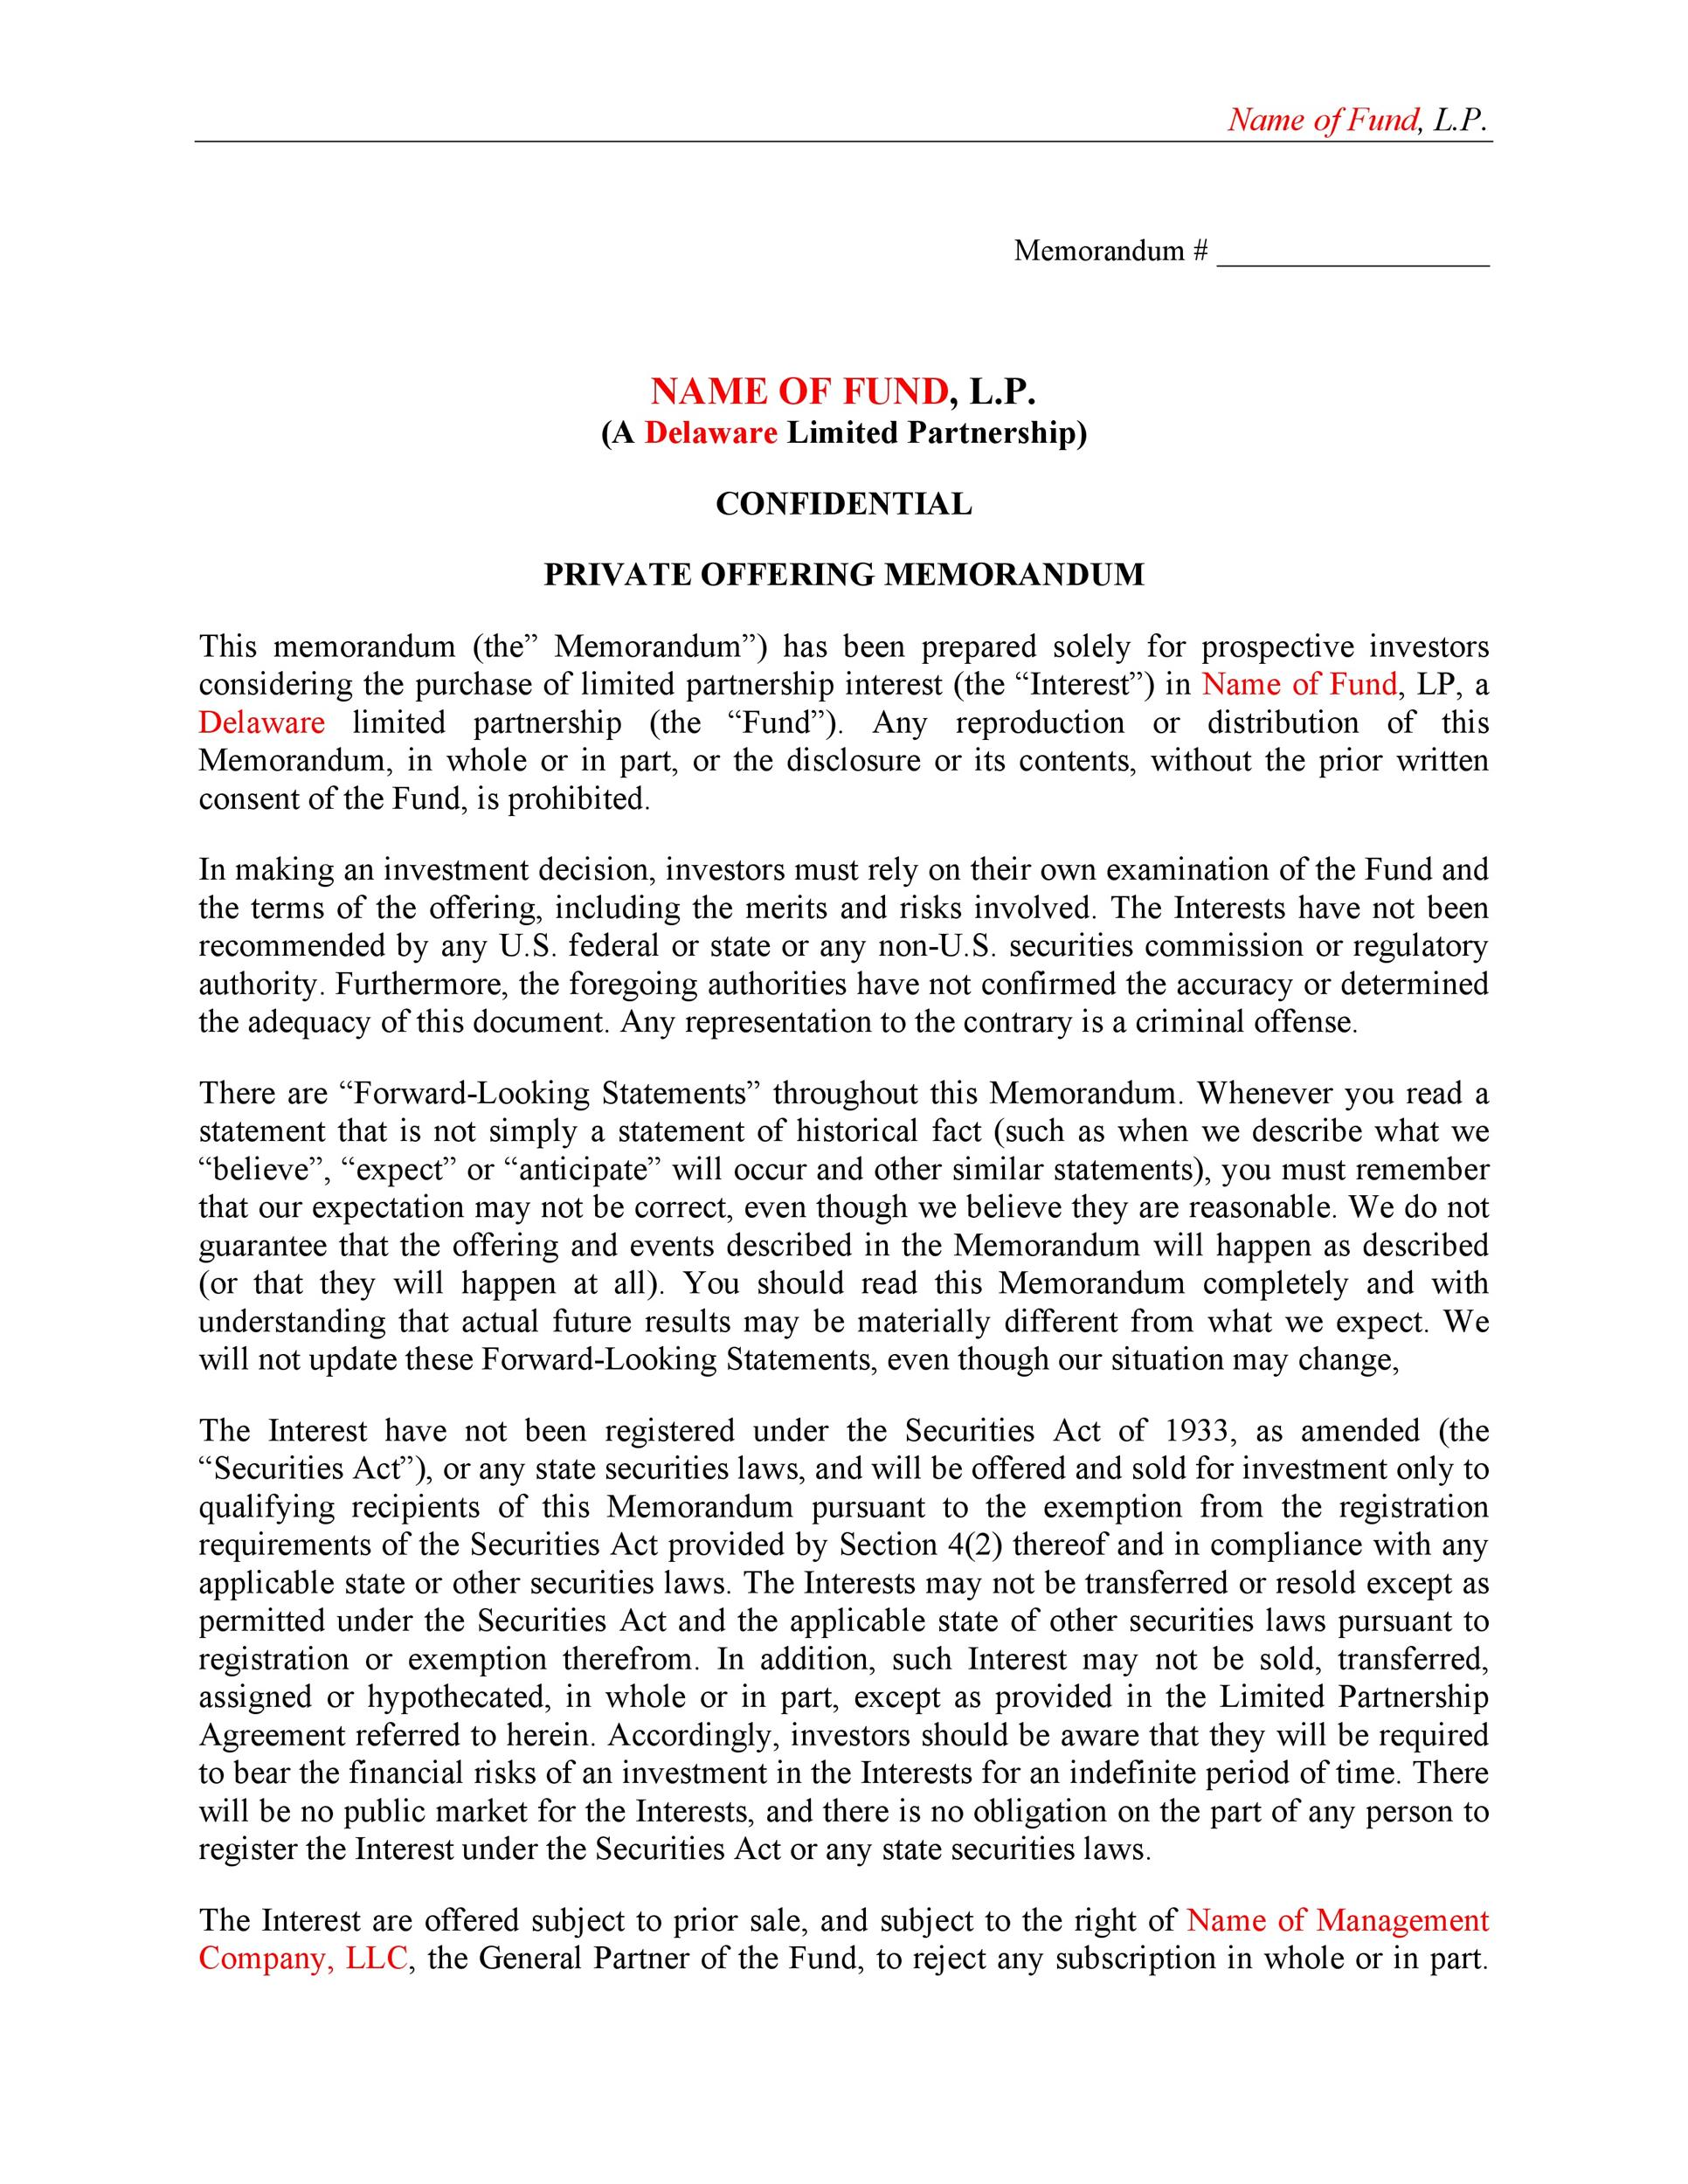 Free private placement memorandum template 29